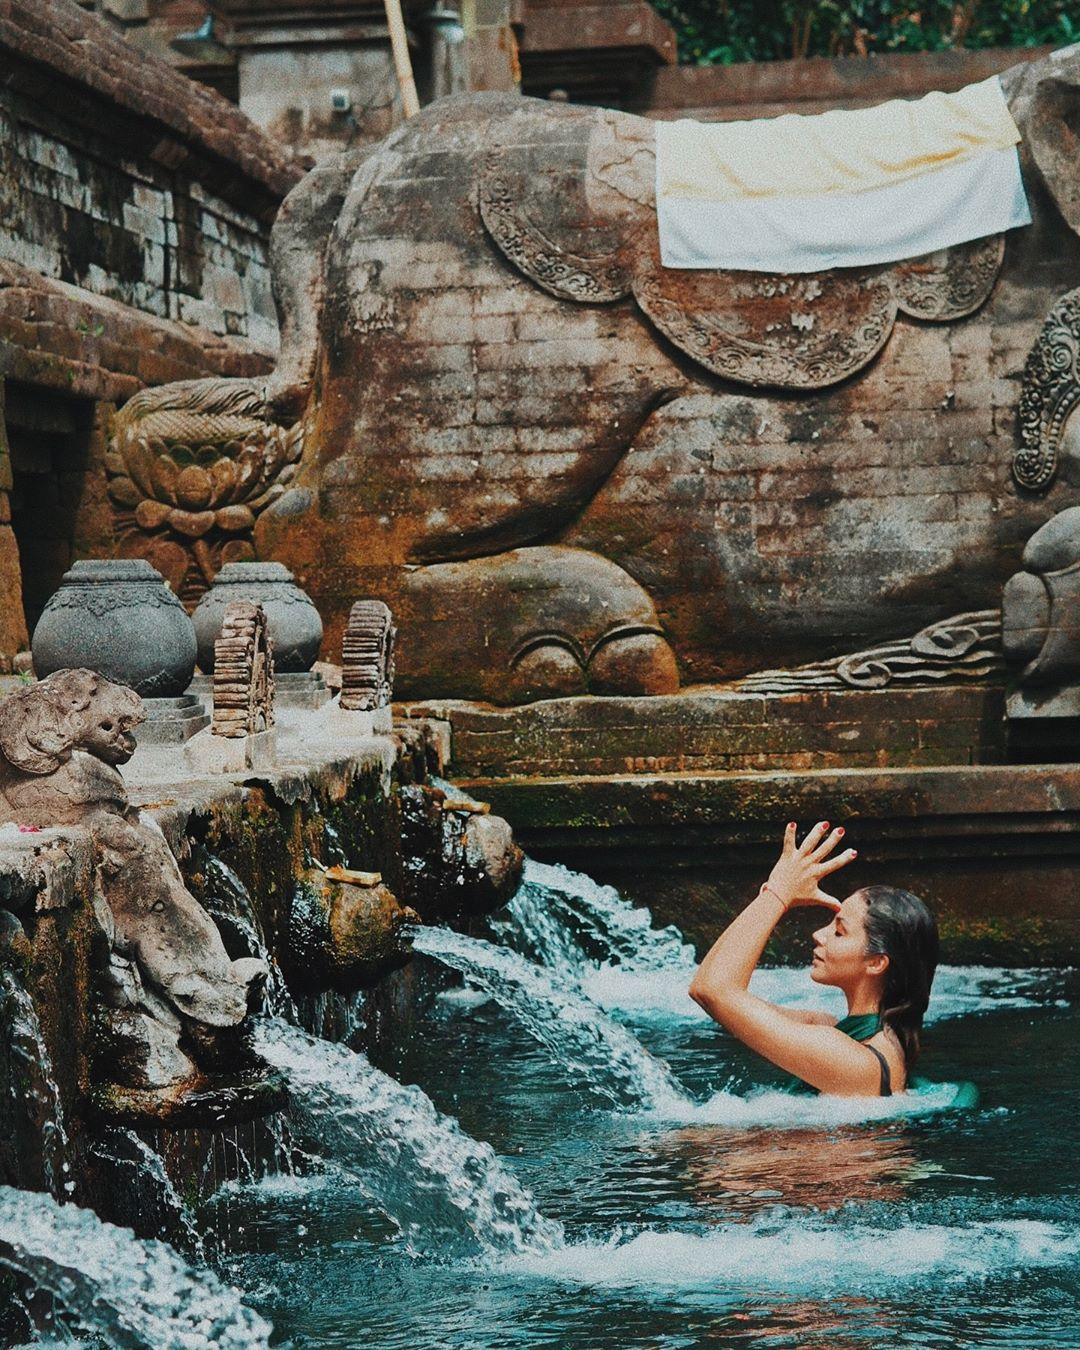 Temples in Bali; Pura Tirta Empul